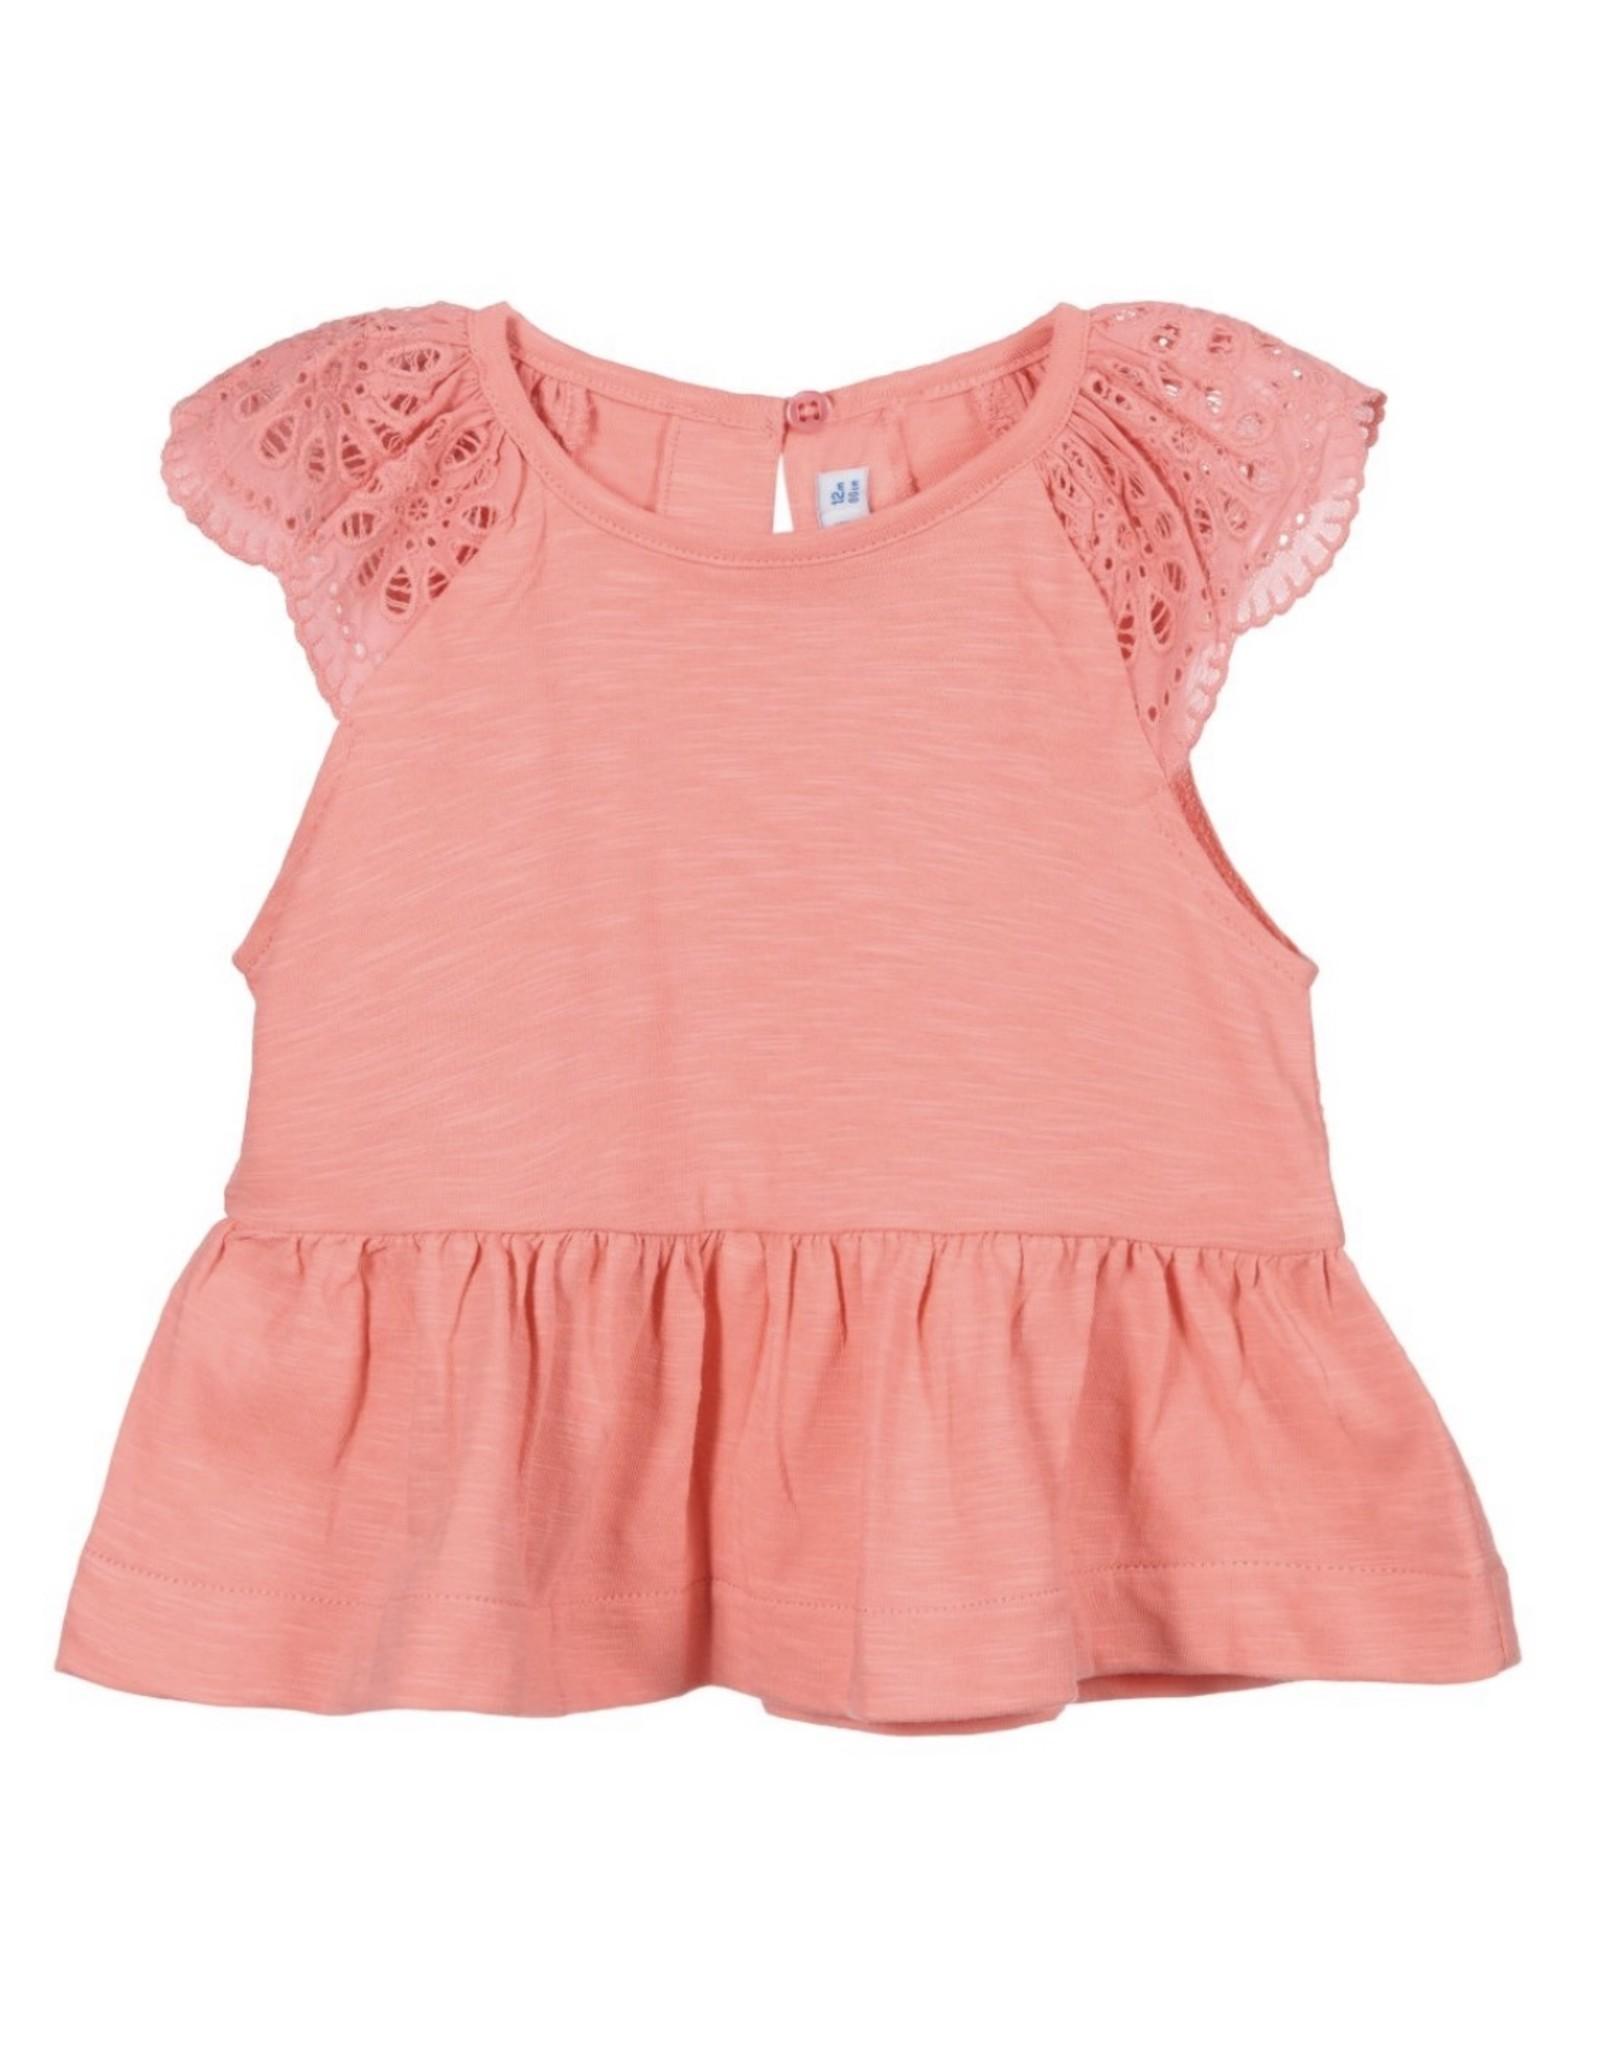 Mayoral Coral Sleeveless T-Shirt Top